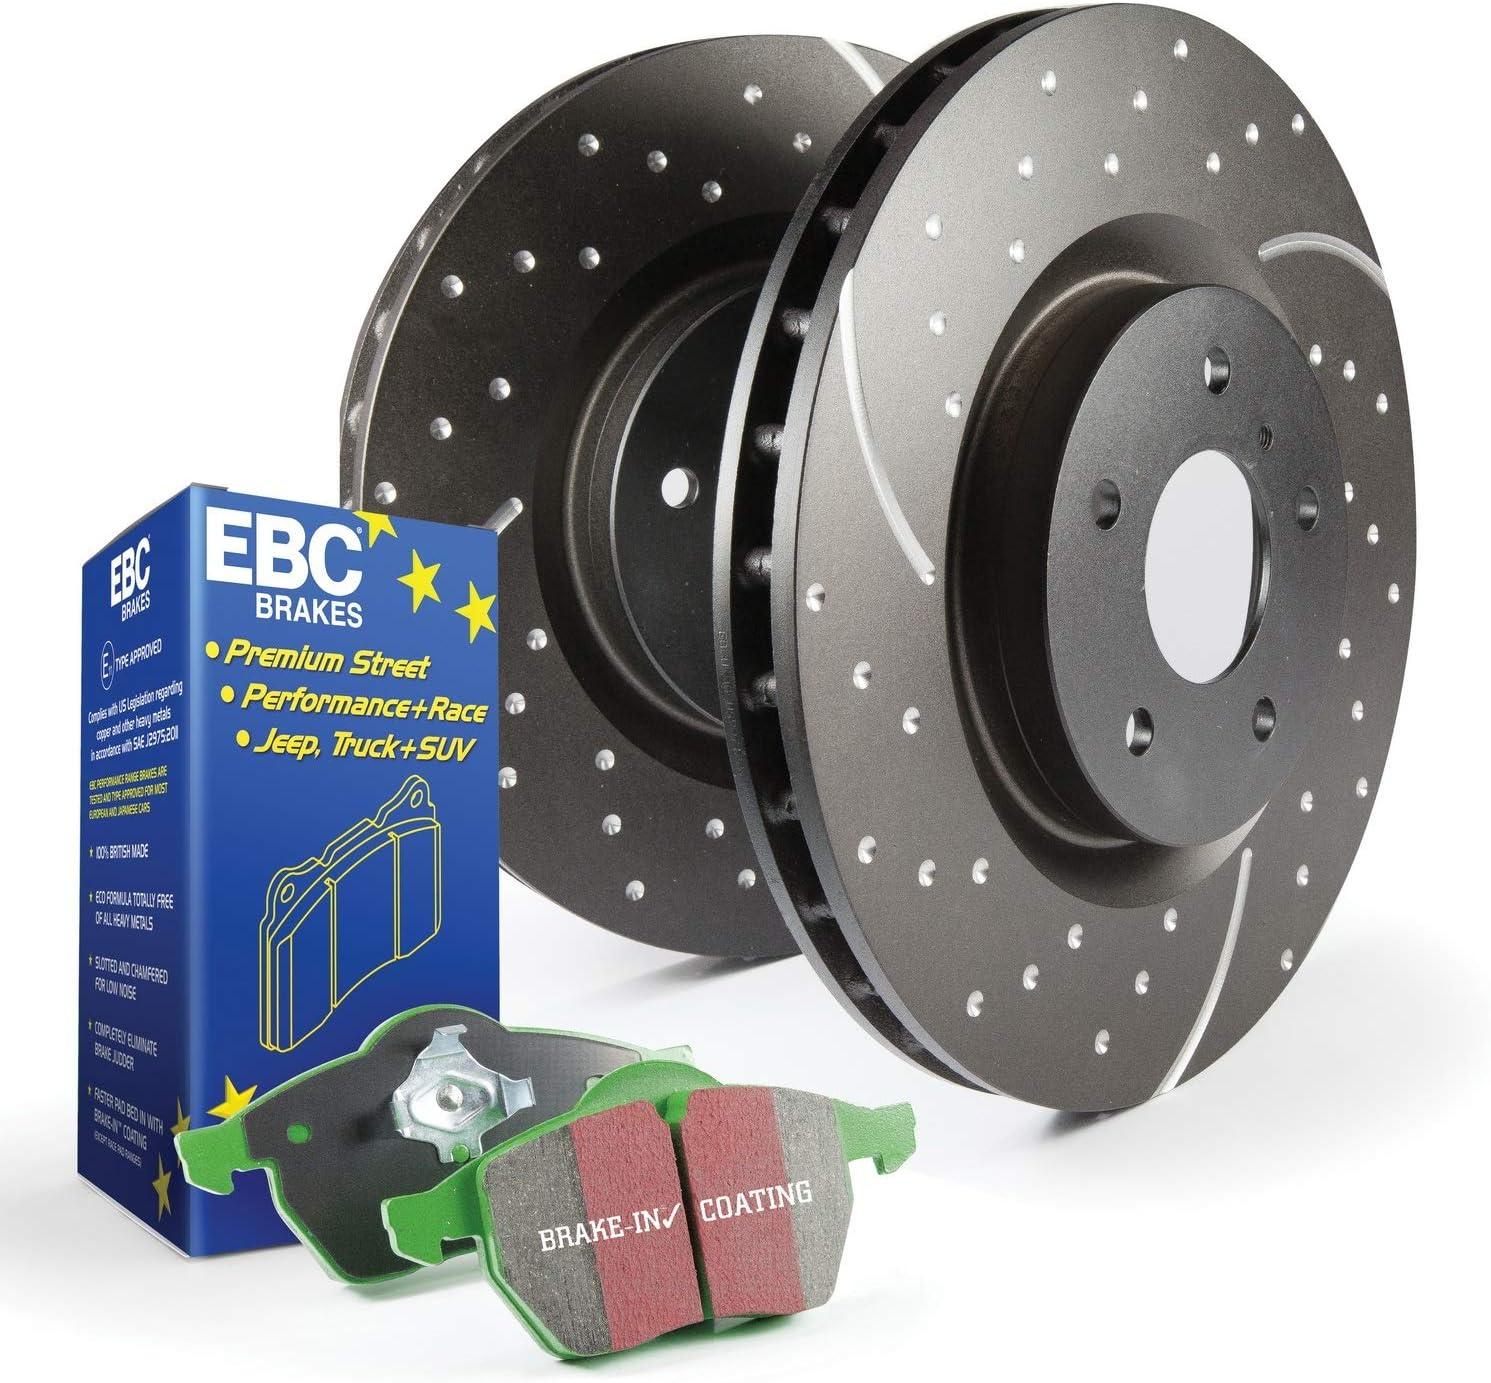 EBC S3KF1051 Stage-3 Truck trust Kit and Popular overseas SUV Brake